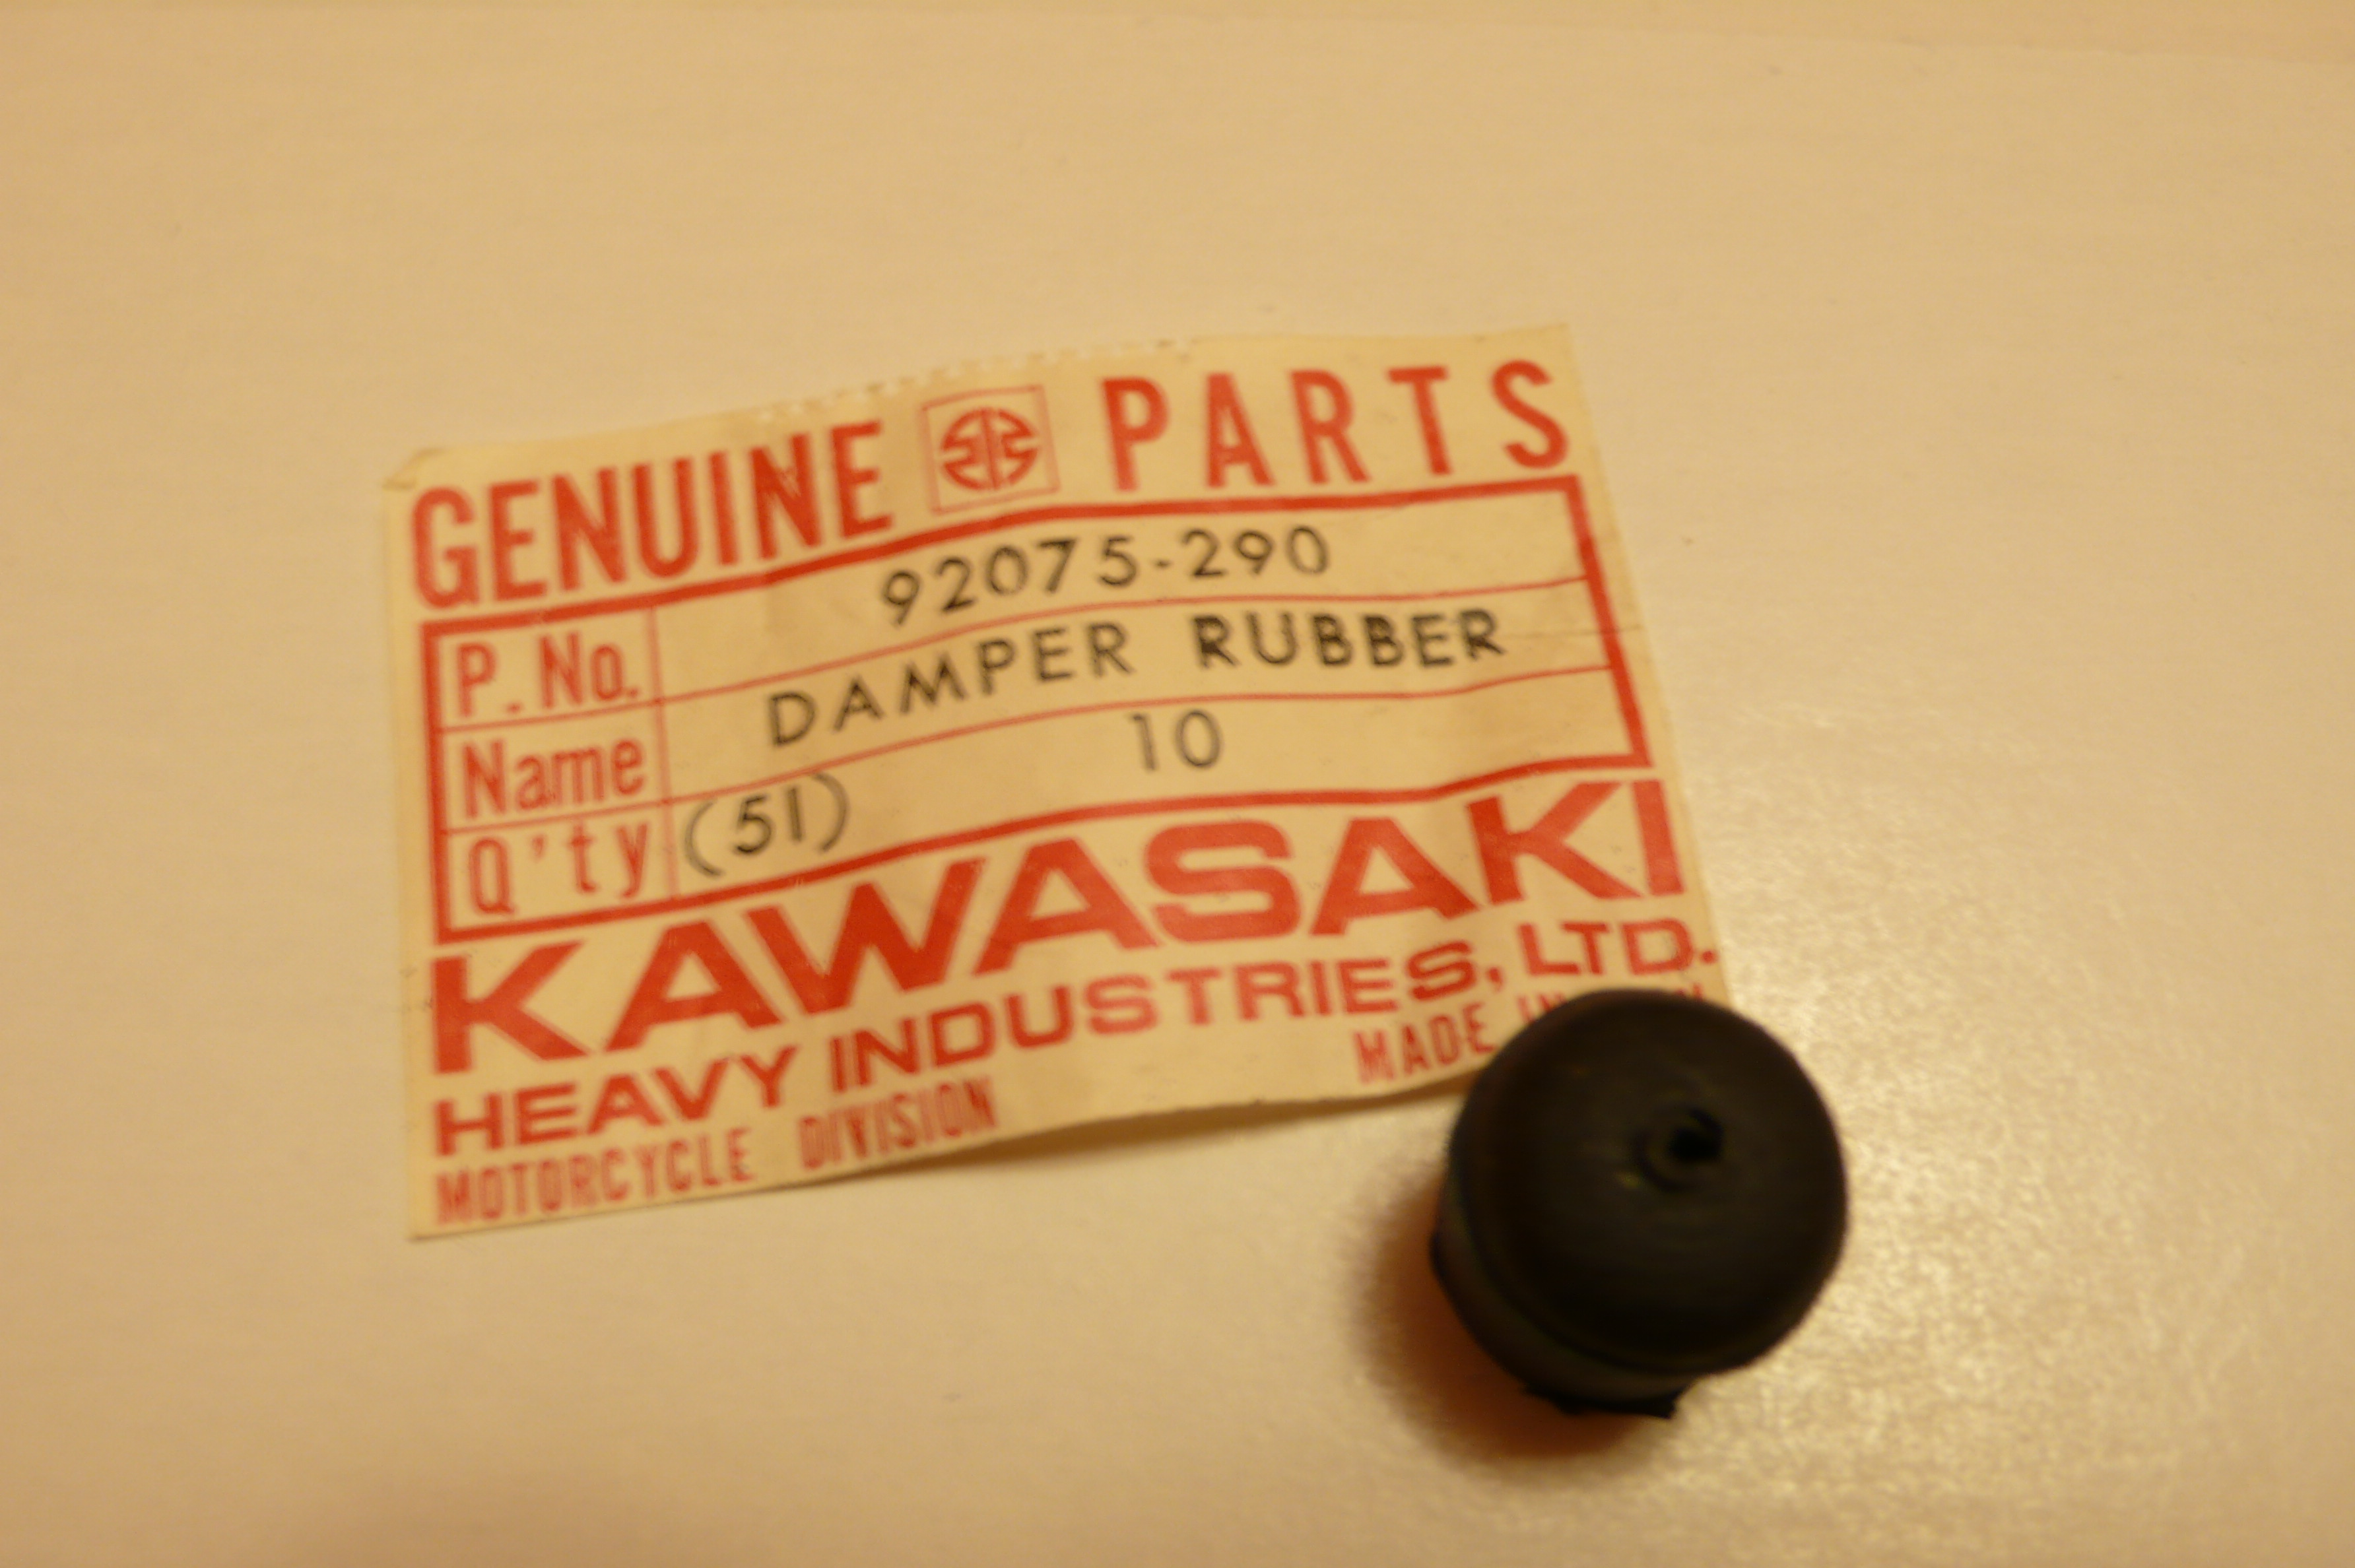 Vintage Kawasaki Online Store 1977 Kz200 Wiring Diagram Rear Fender Damper